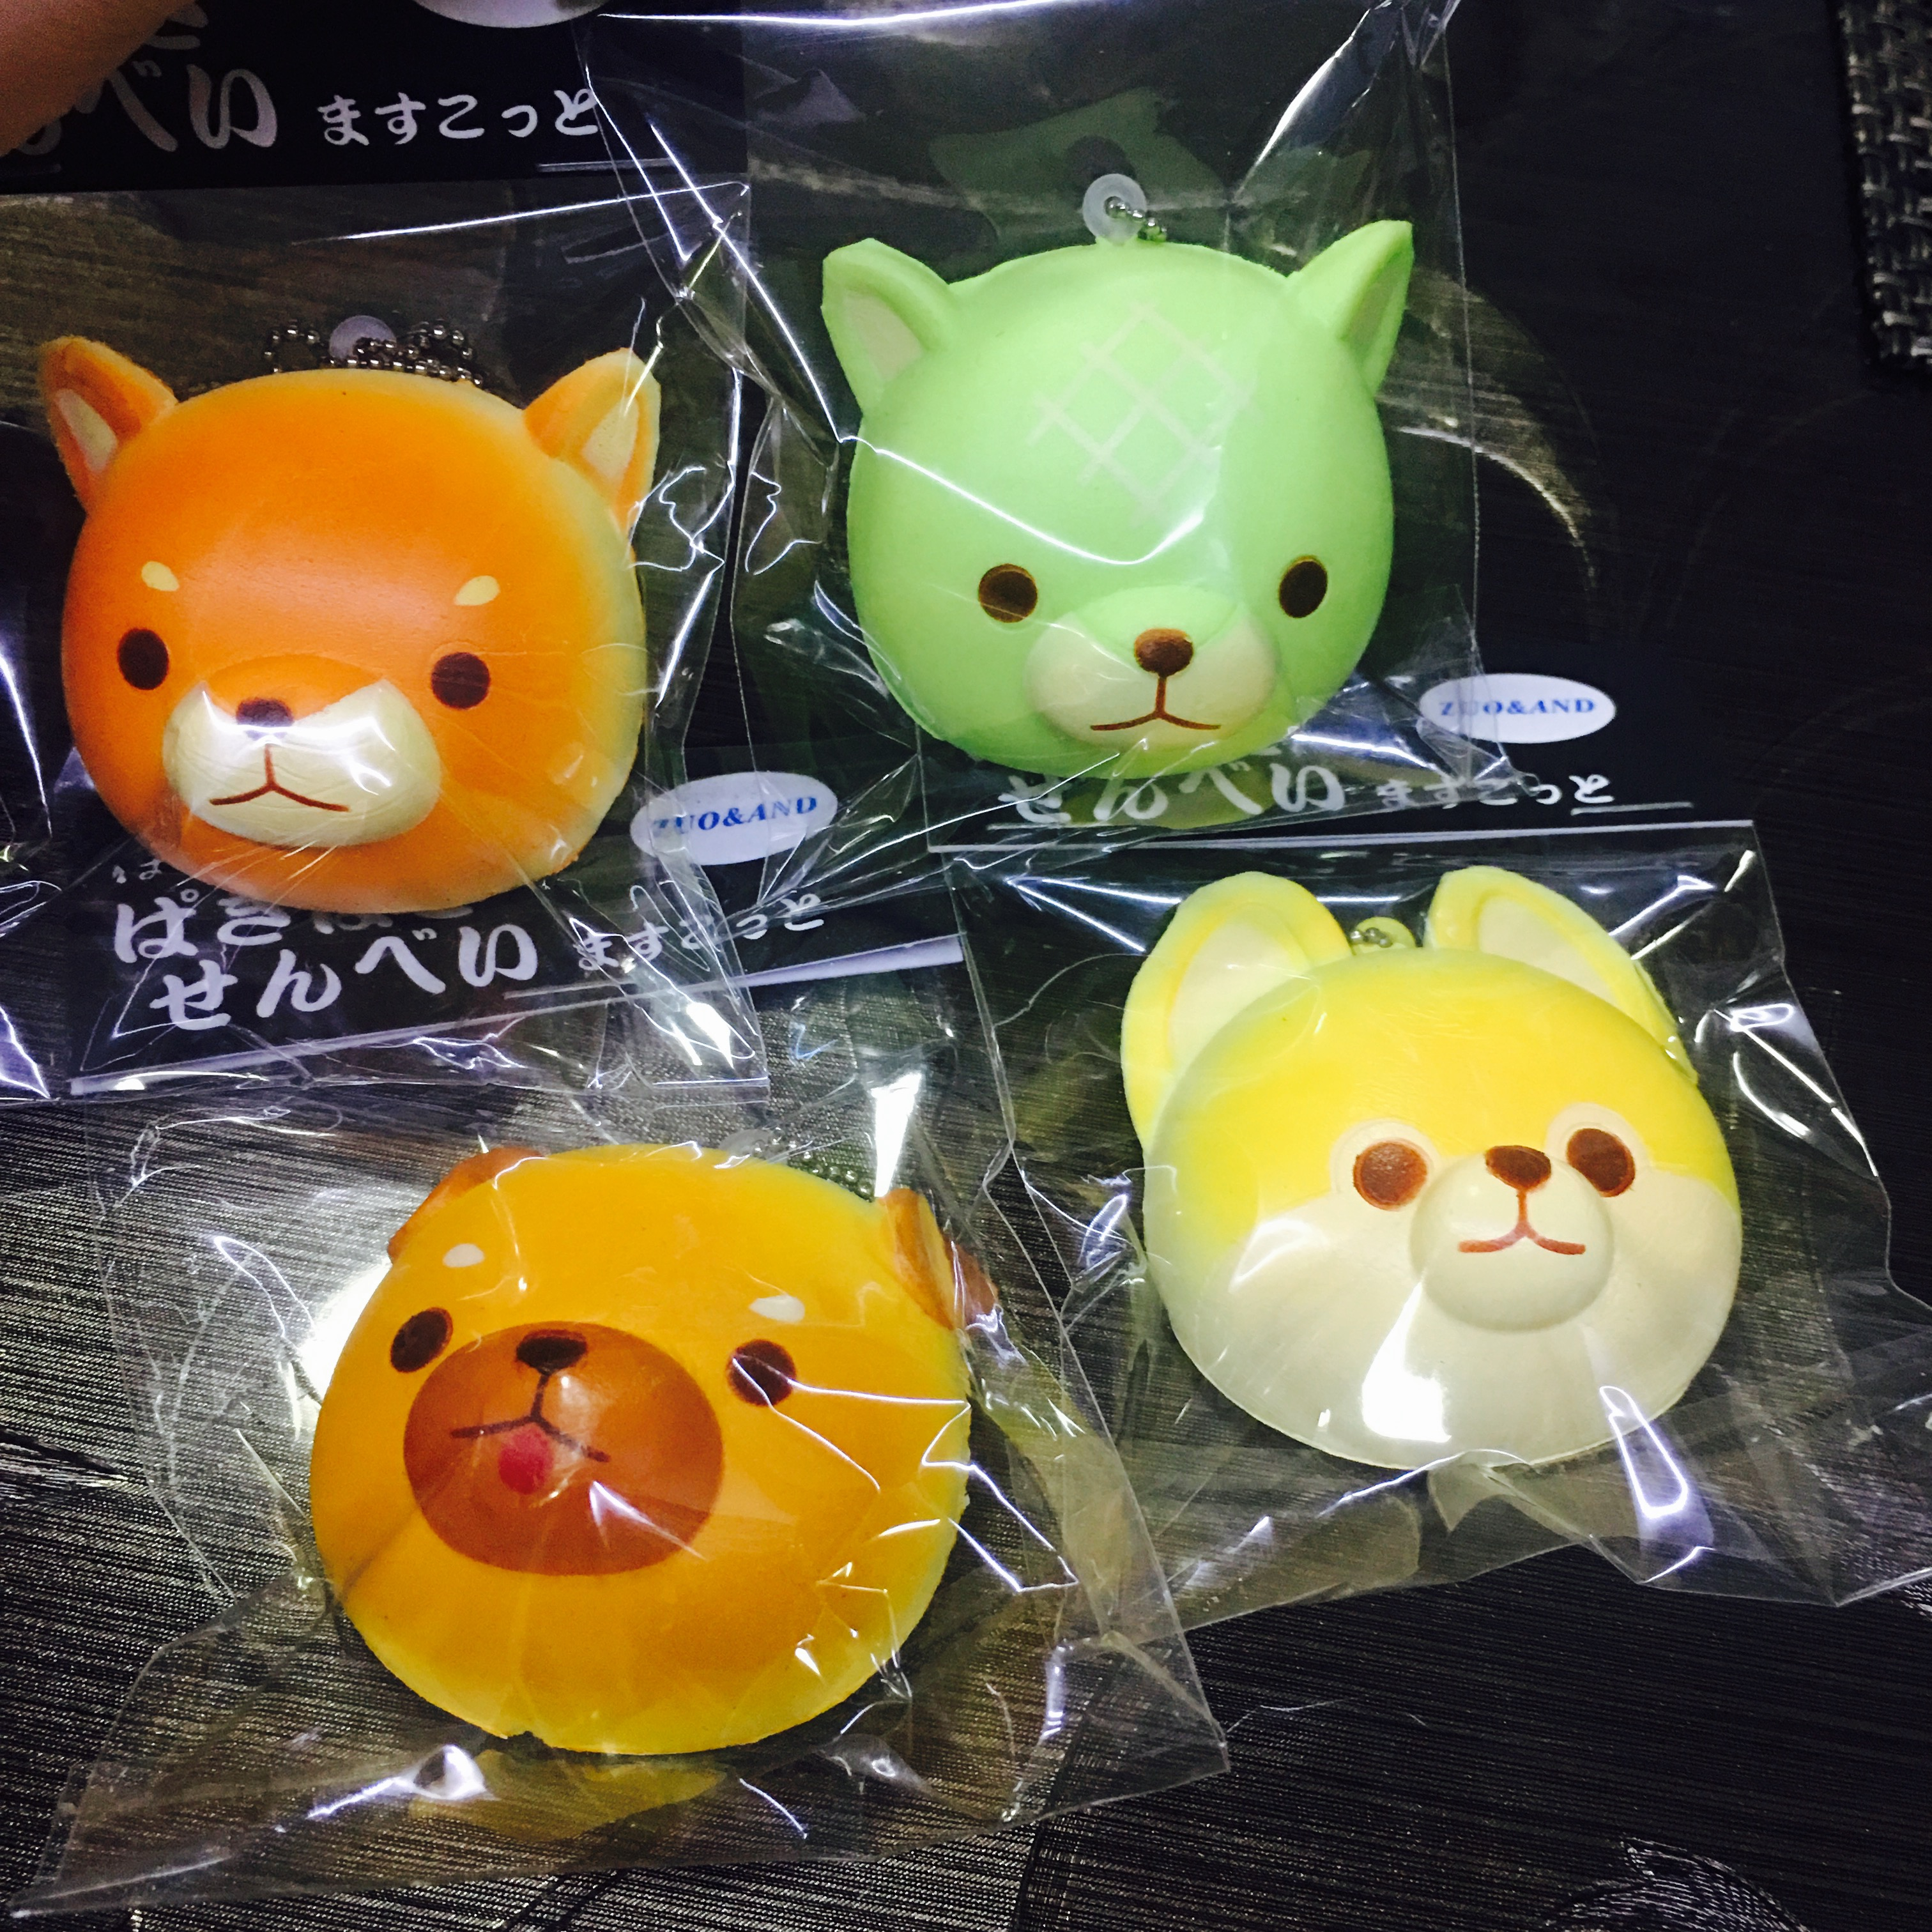 Squishy Head Bun : ~SquishyStuff~ CUTE!!! Puppy Head Bun Squishy Ball Chain Online Store Powered by Storenvy